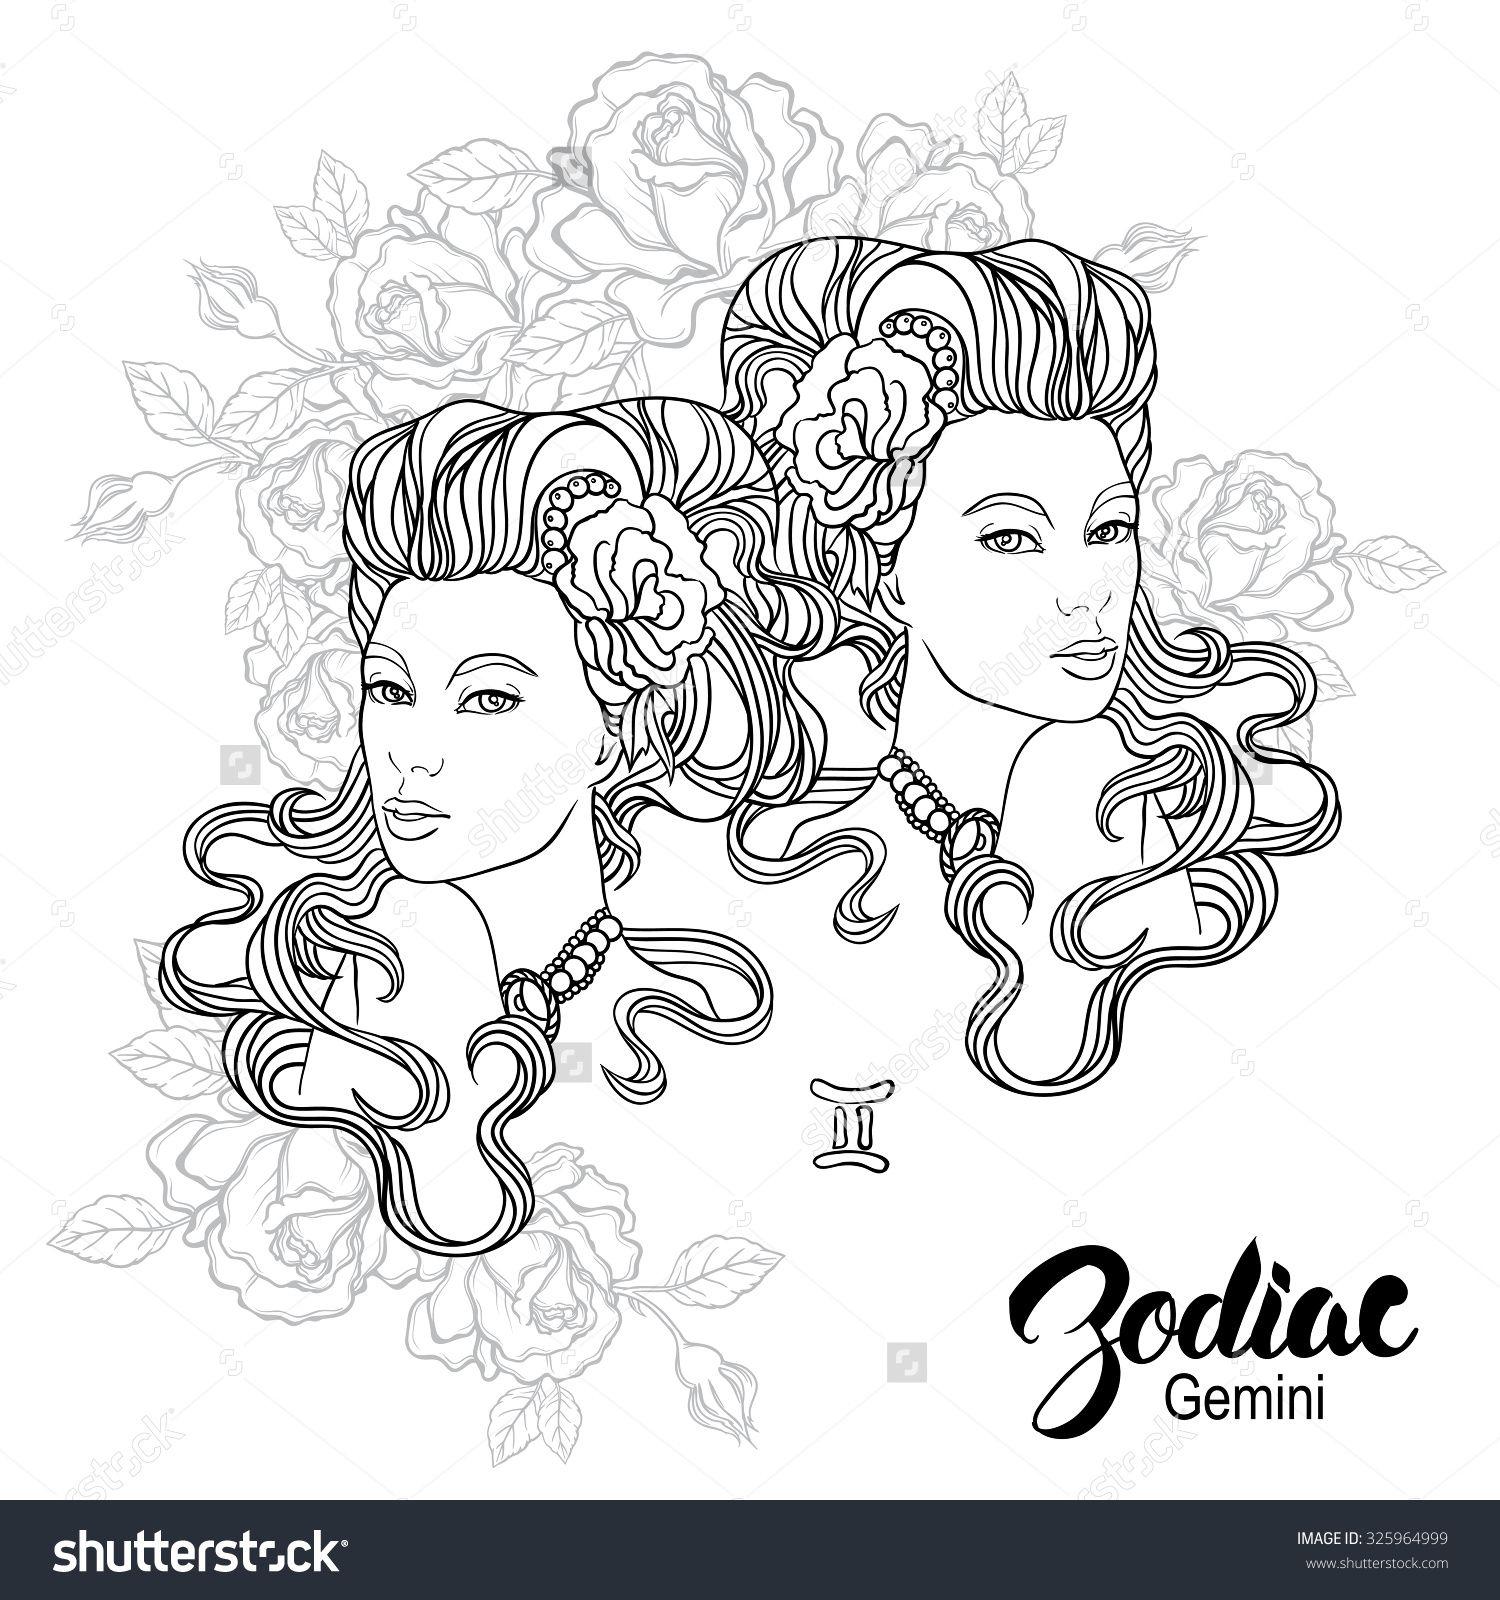 Zodiac Gemini Girl Coloring Book Page Shutterstock